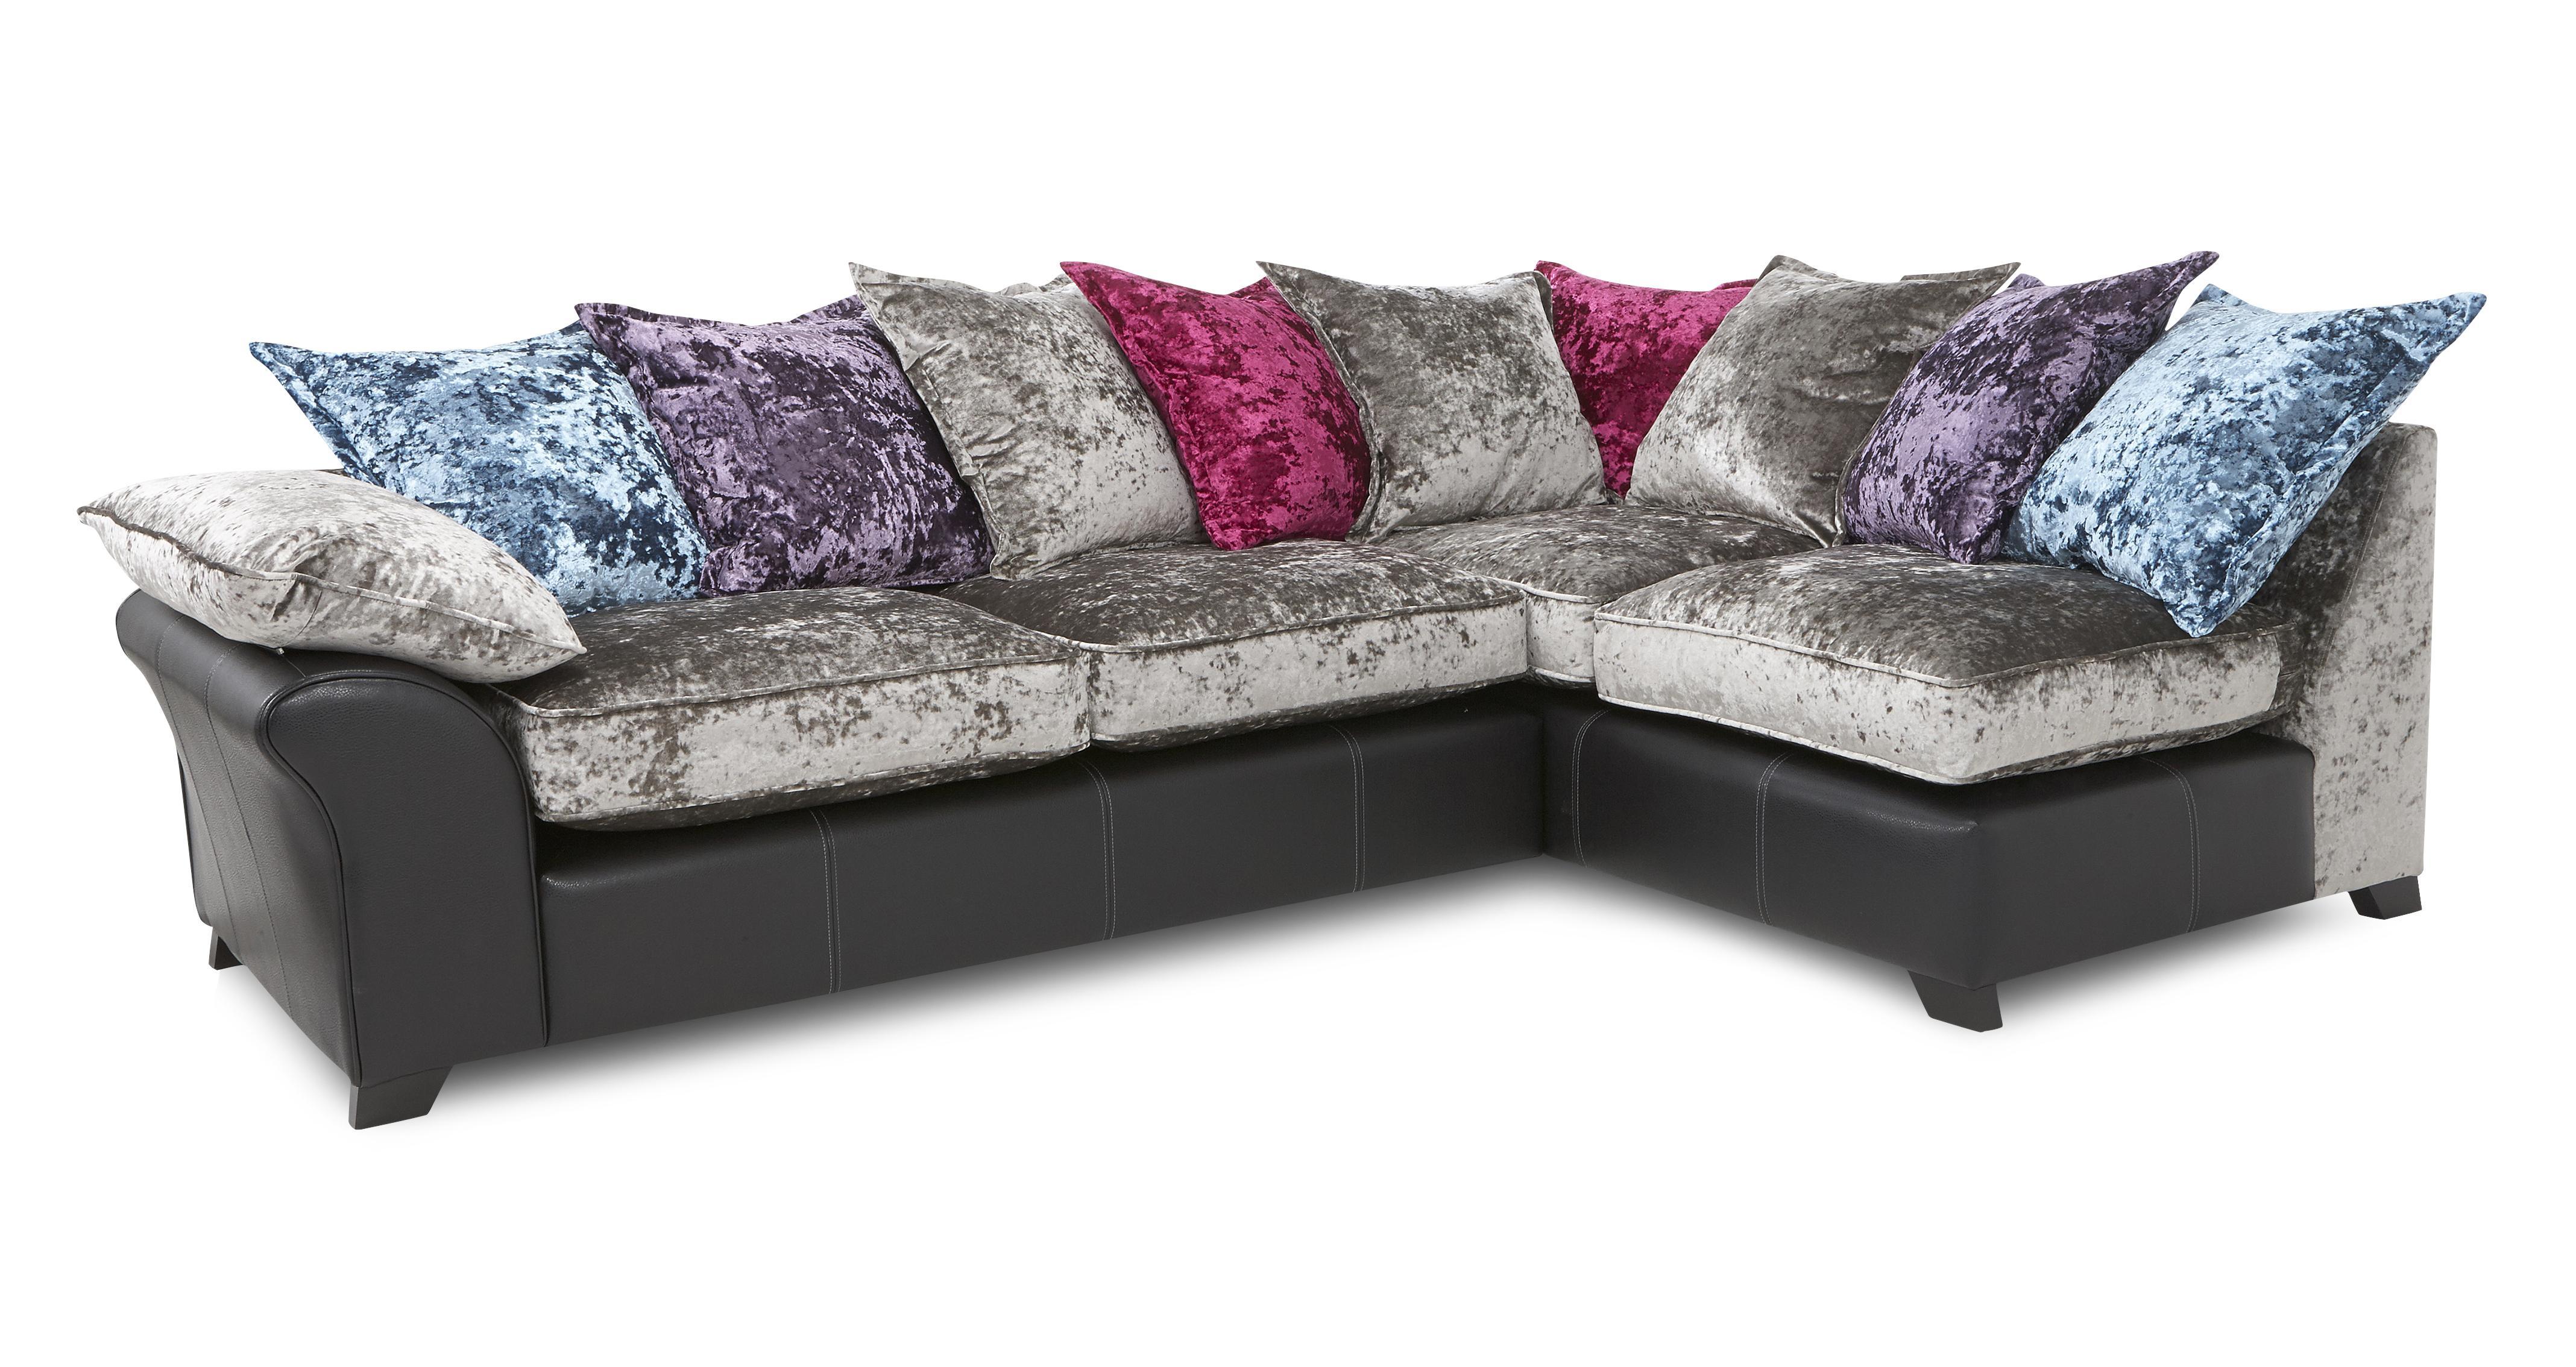 dfs corner sofa and swivel chair loveseat sleeper memory foam sequence set large foot stool